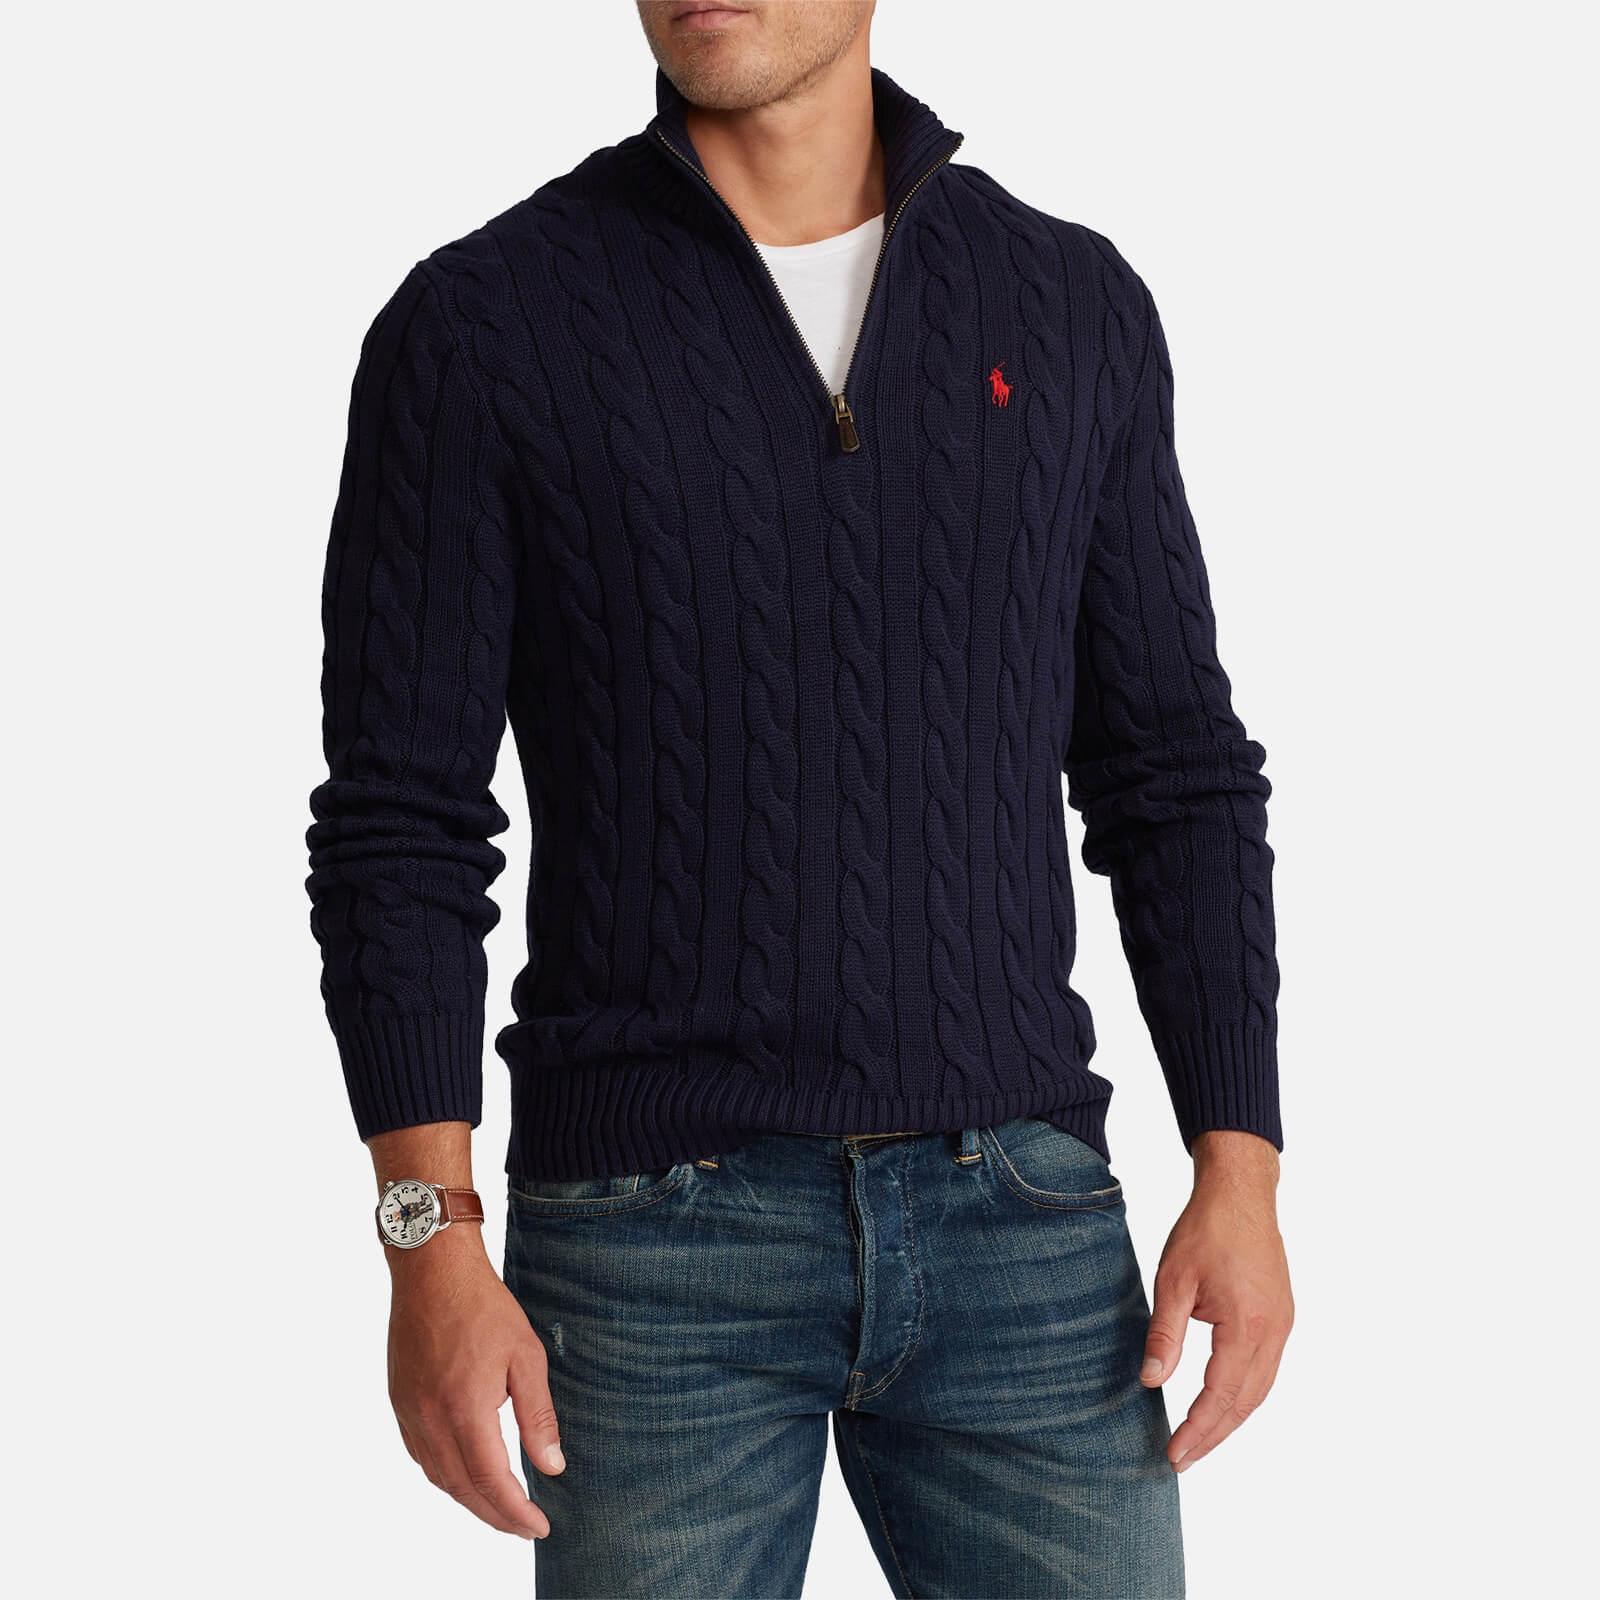 Polo Ralph Lauren Men's Cable Knit Cotton Half Zip Jumper - Hunter Navy - S